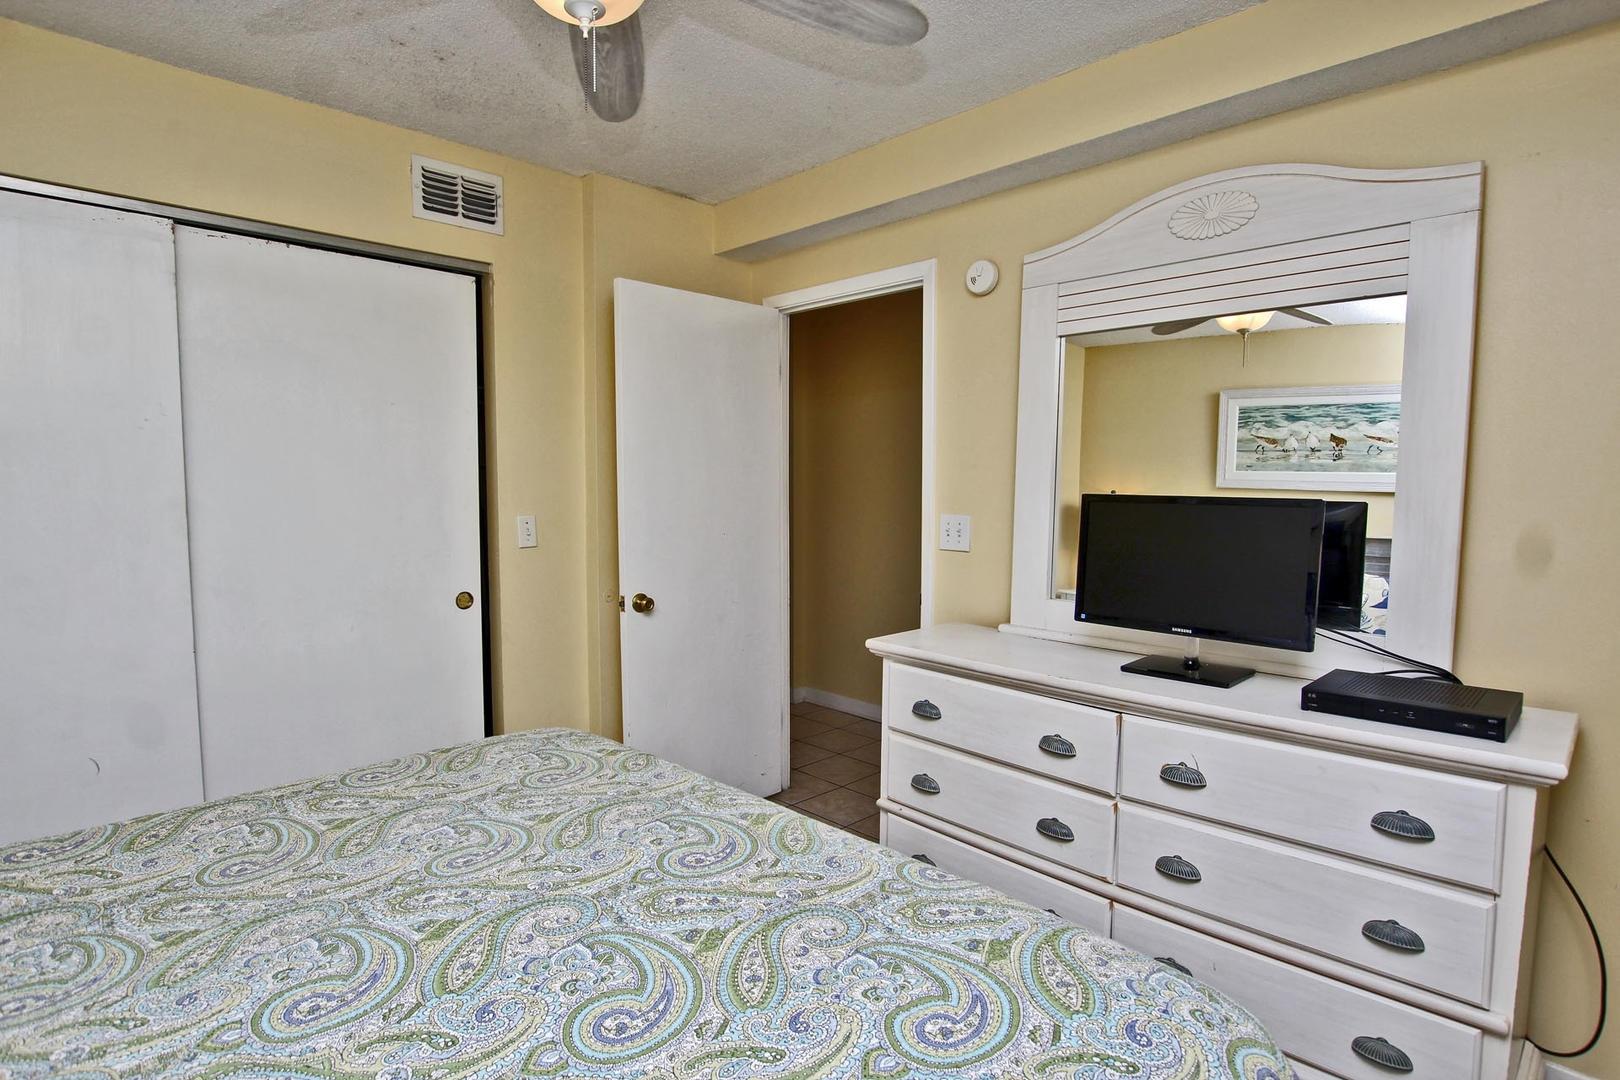 Closet and Dresser Space